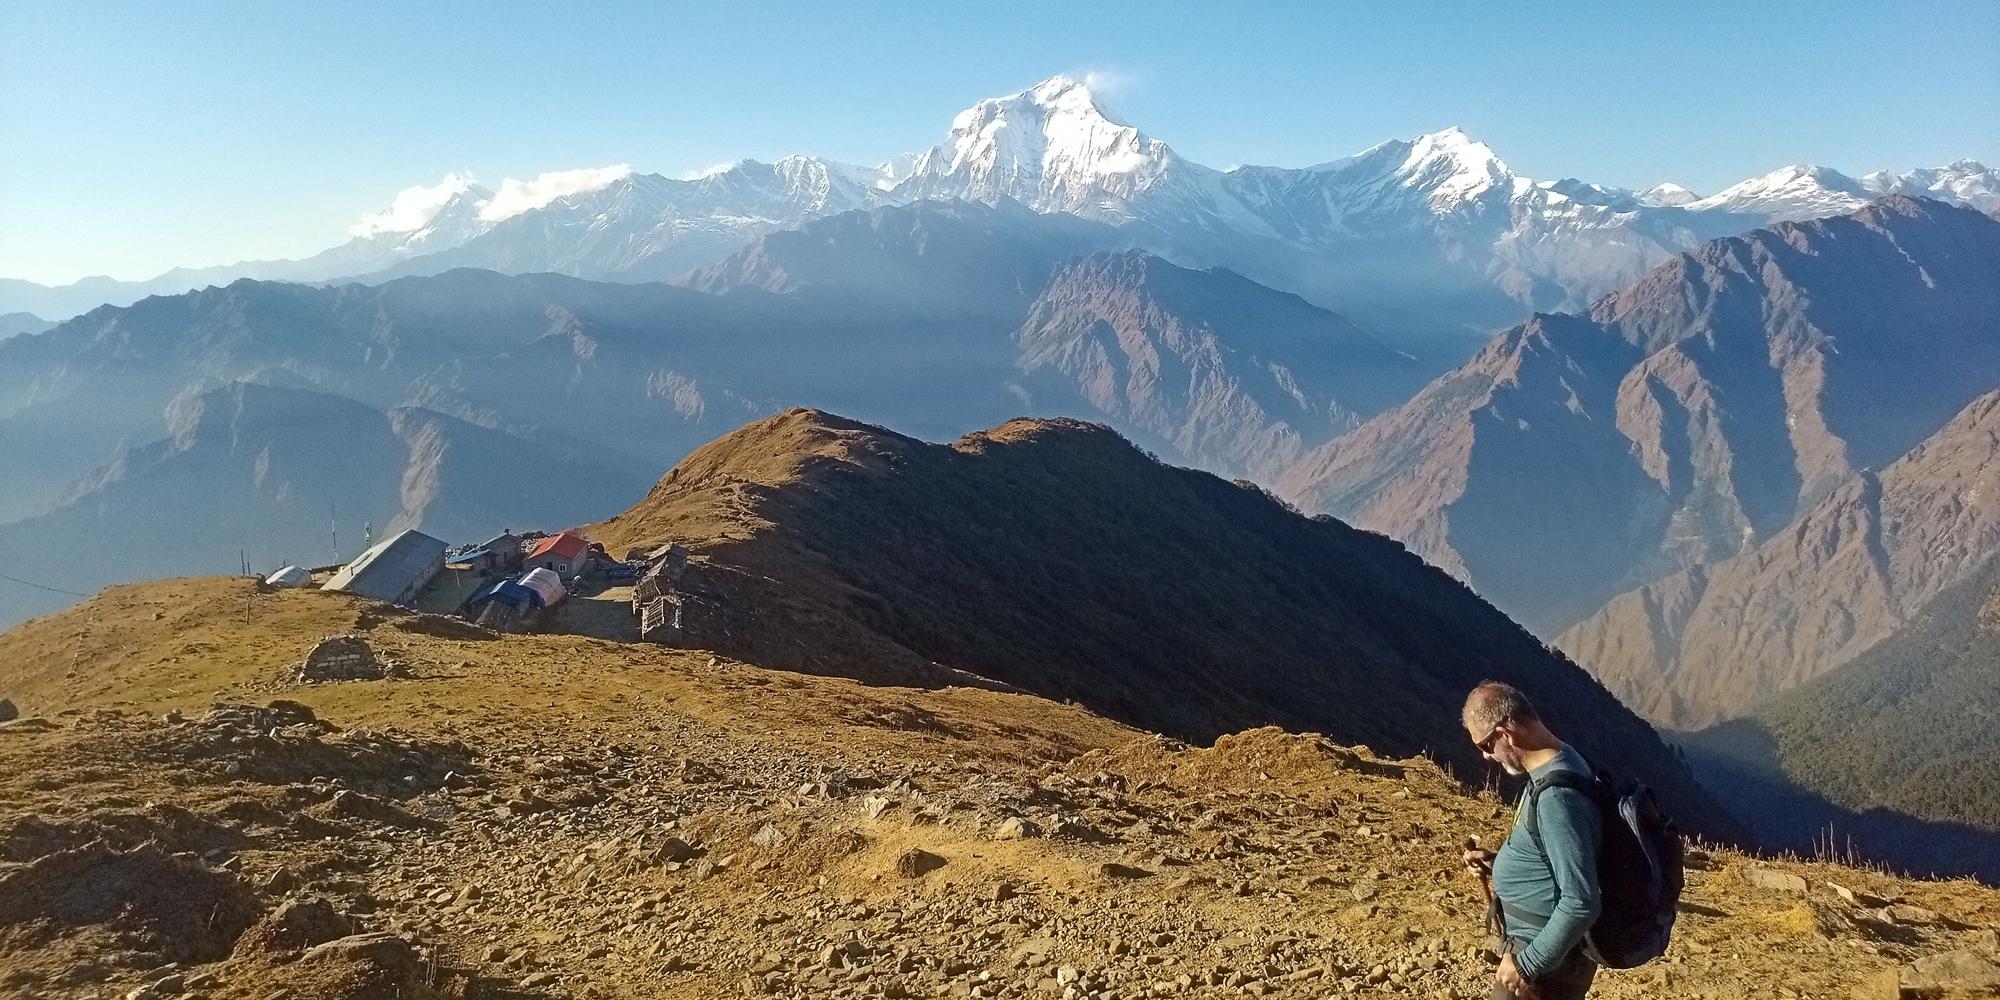 Khair Lake and Khopra Ridge Trekking